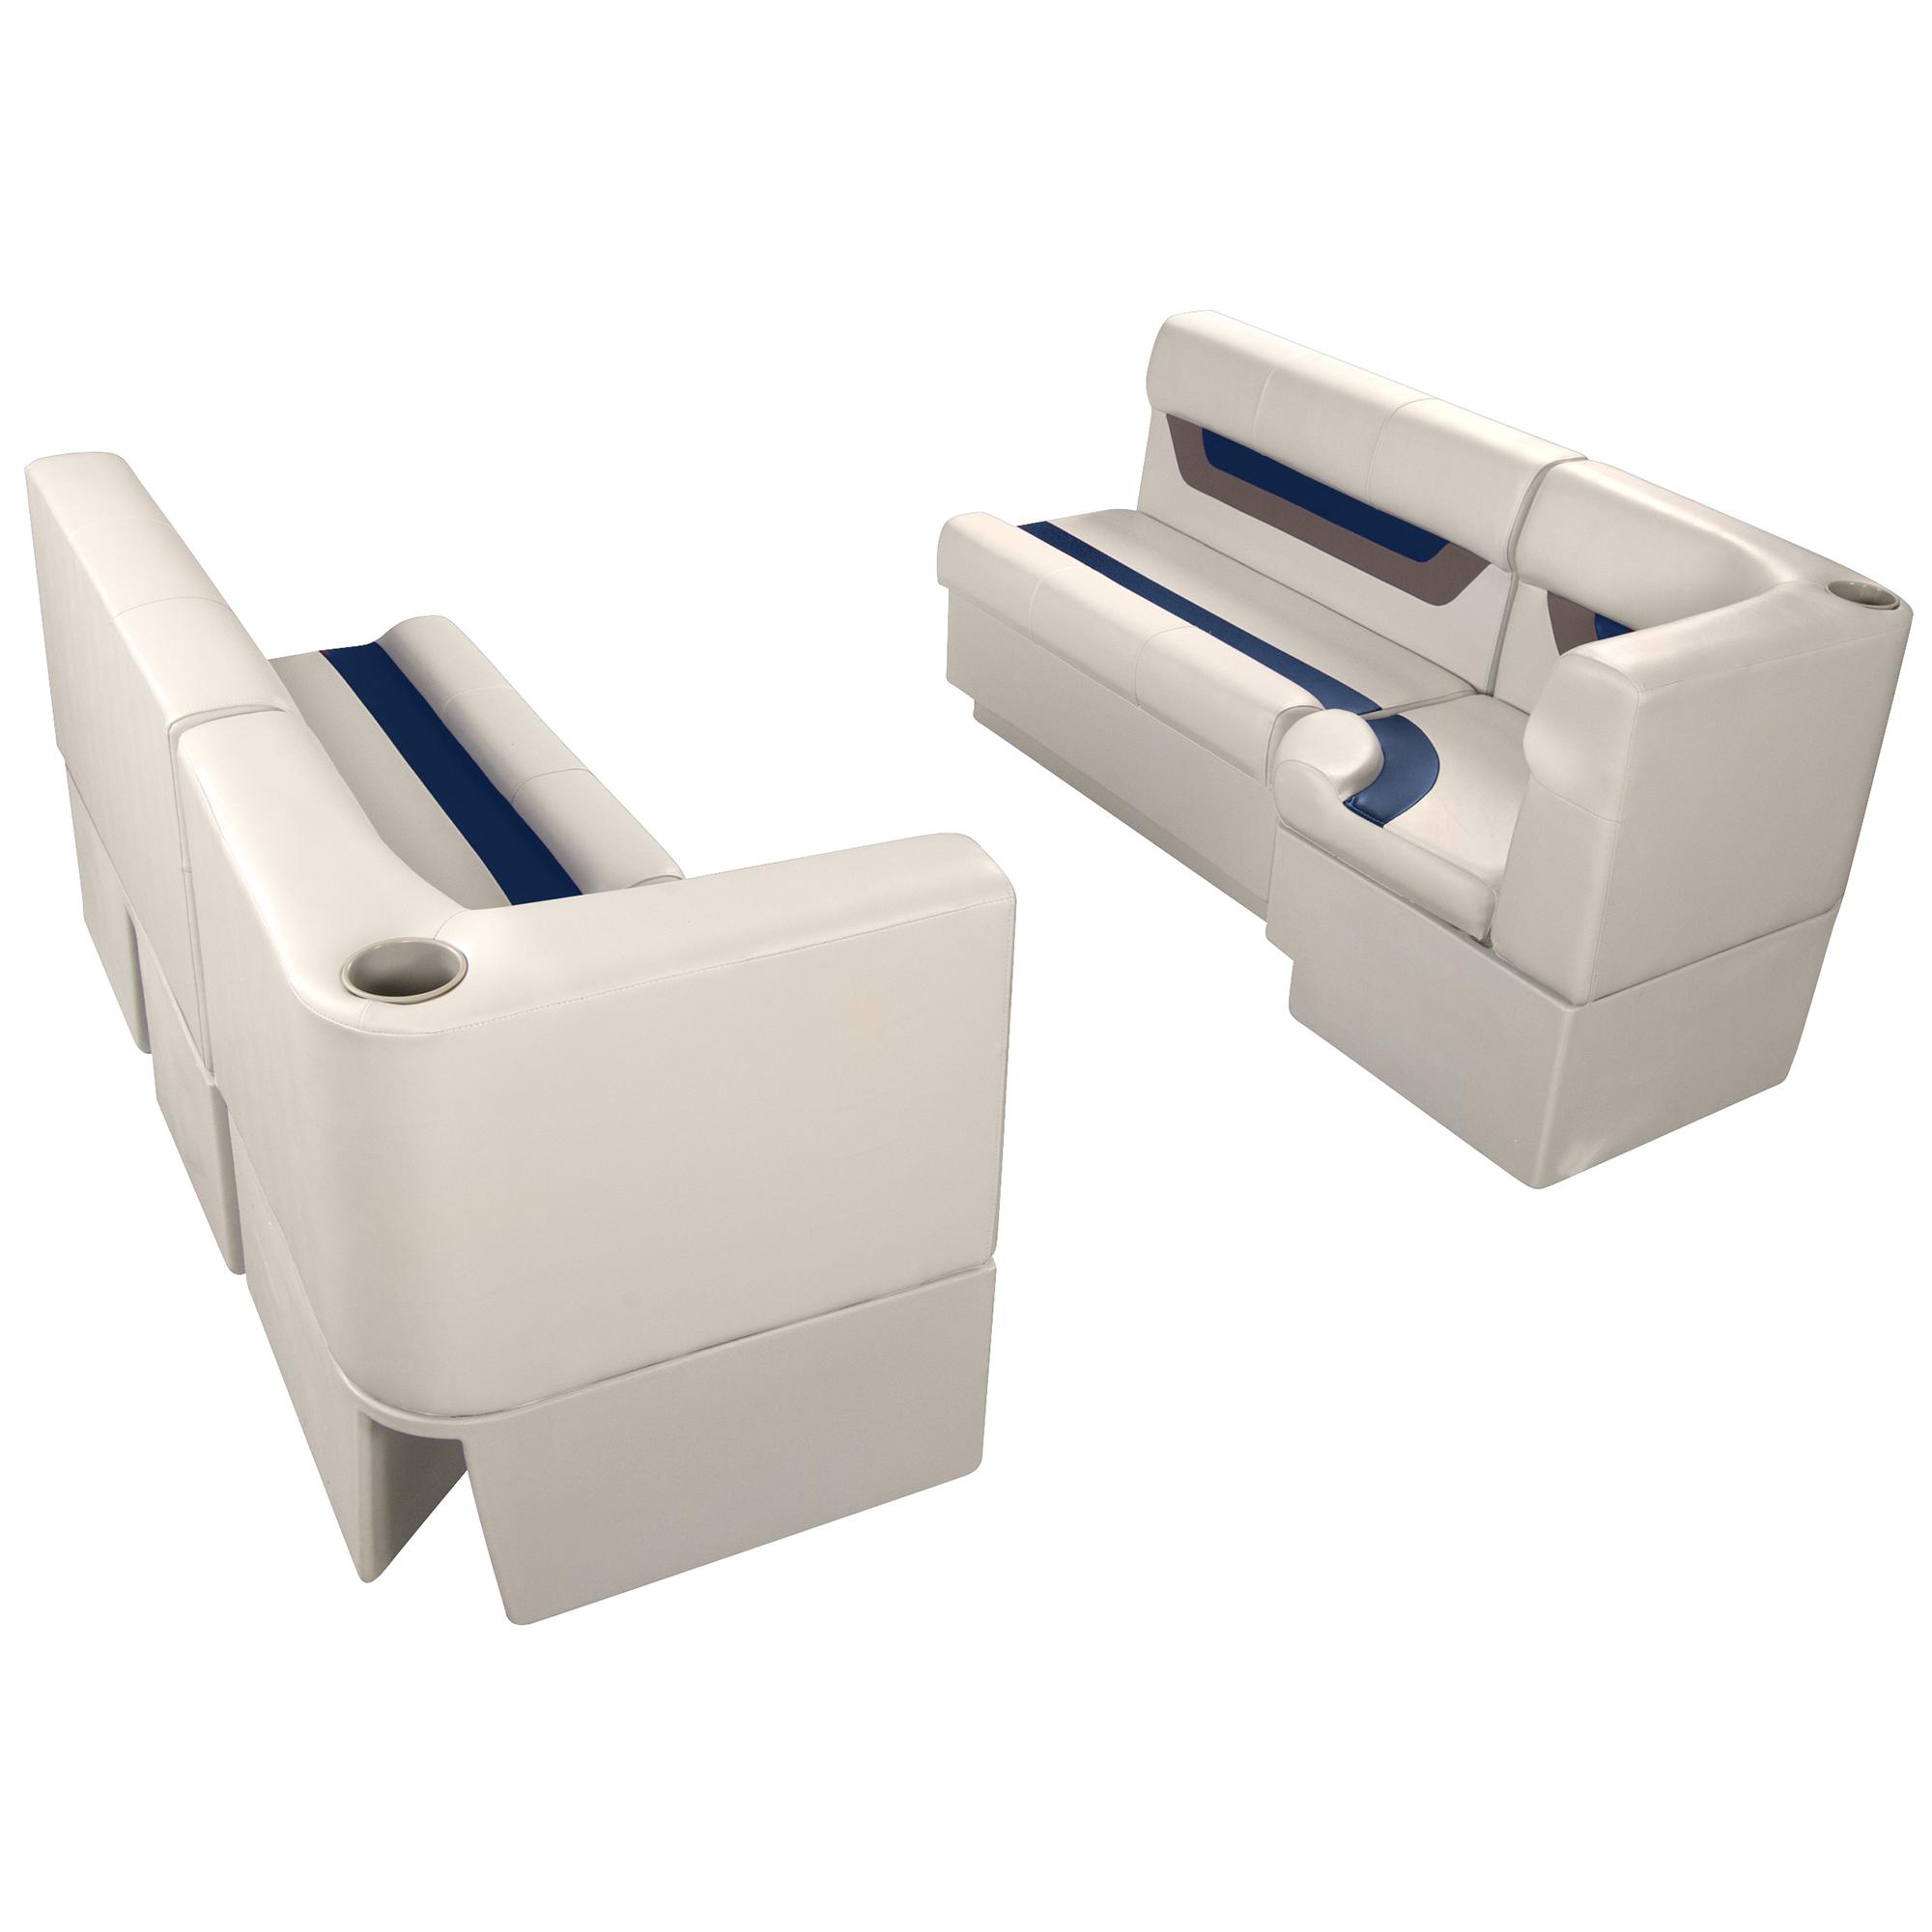 "Designer Pontoon Furniture - 61"" Front Seat Package, Platinum/Midnight/Mocha"